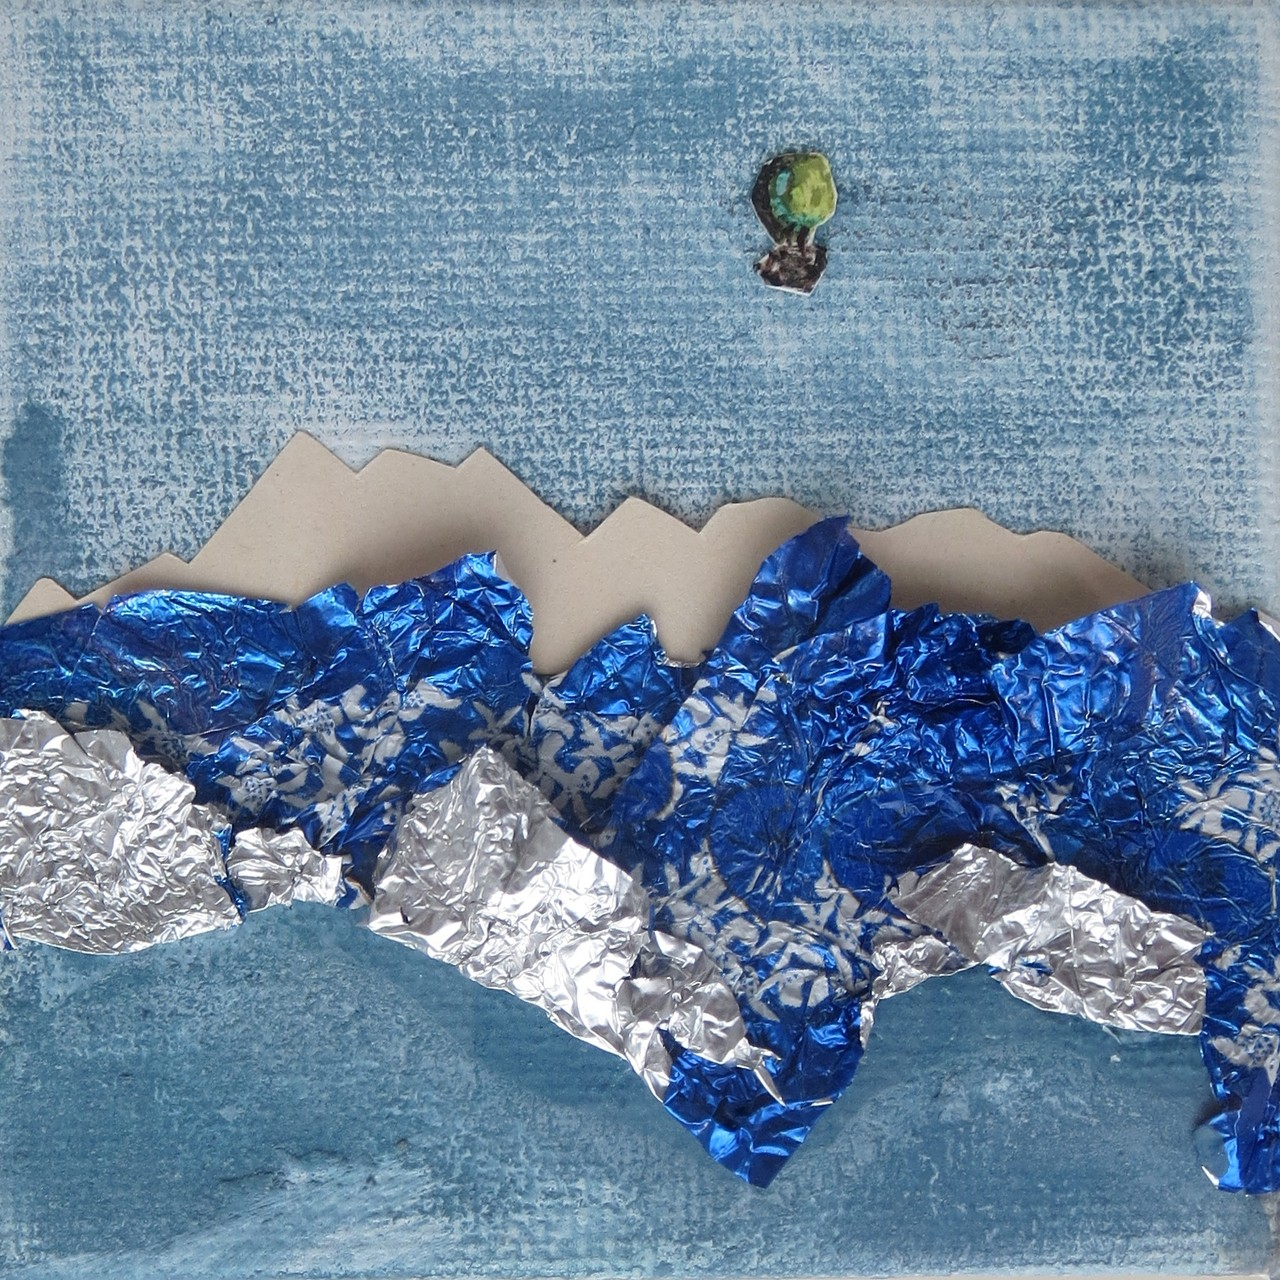 BALLONFAHRT, 2013, Johannes Morten, 10 x 10 cm, Acryl, Papier, Aquarell, Papier und Aluminium auf Canvas